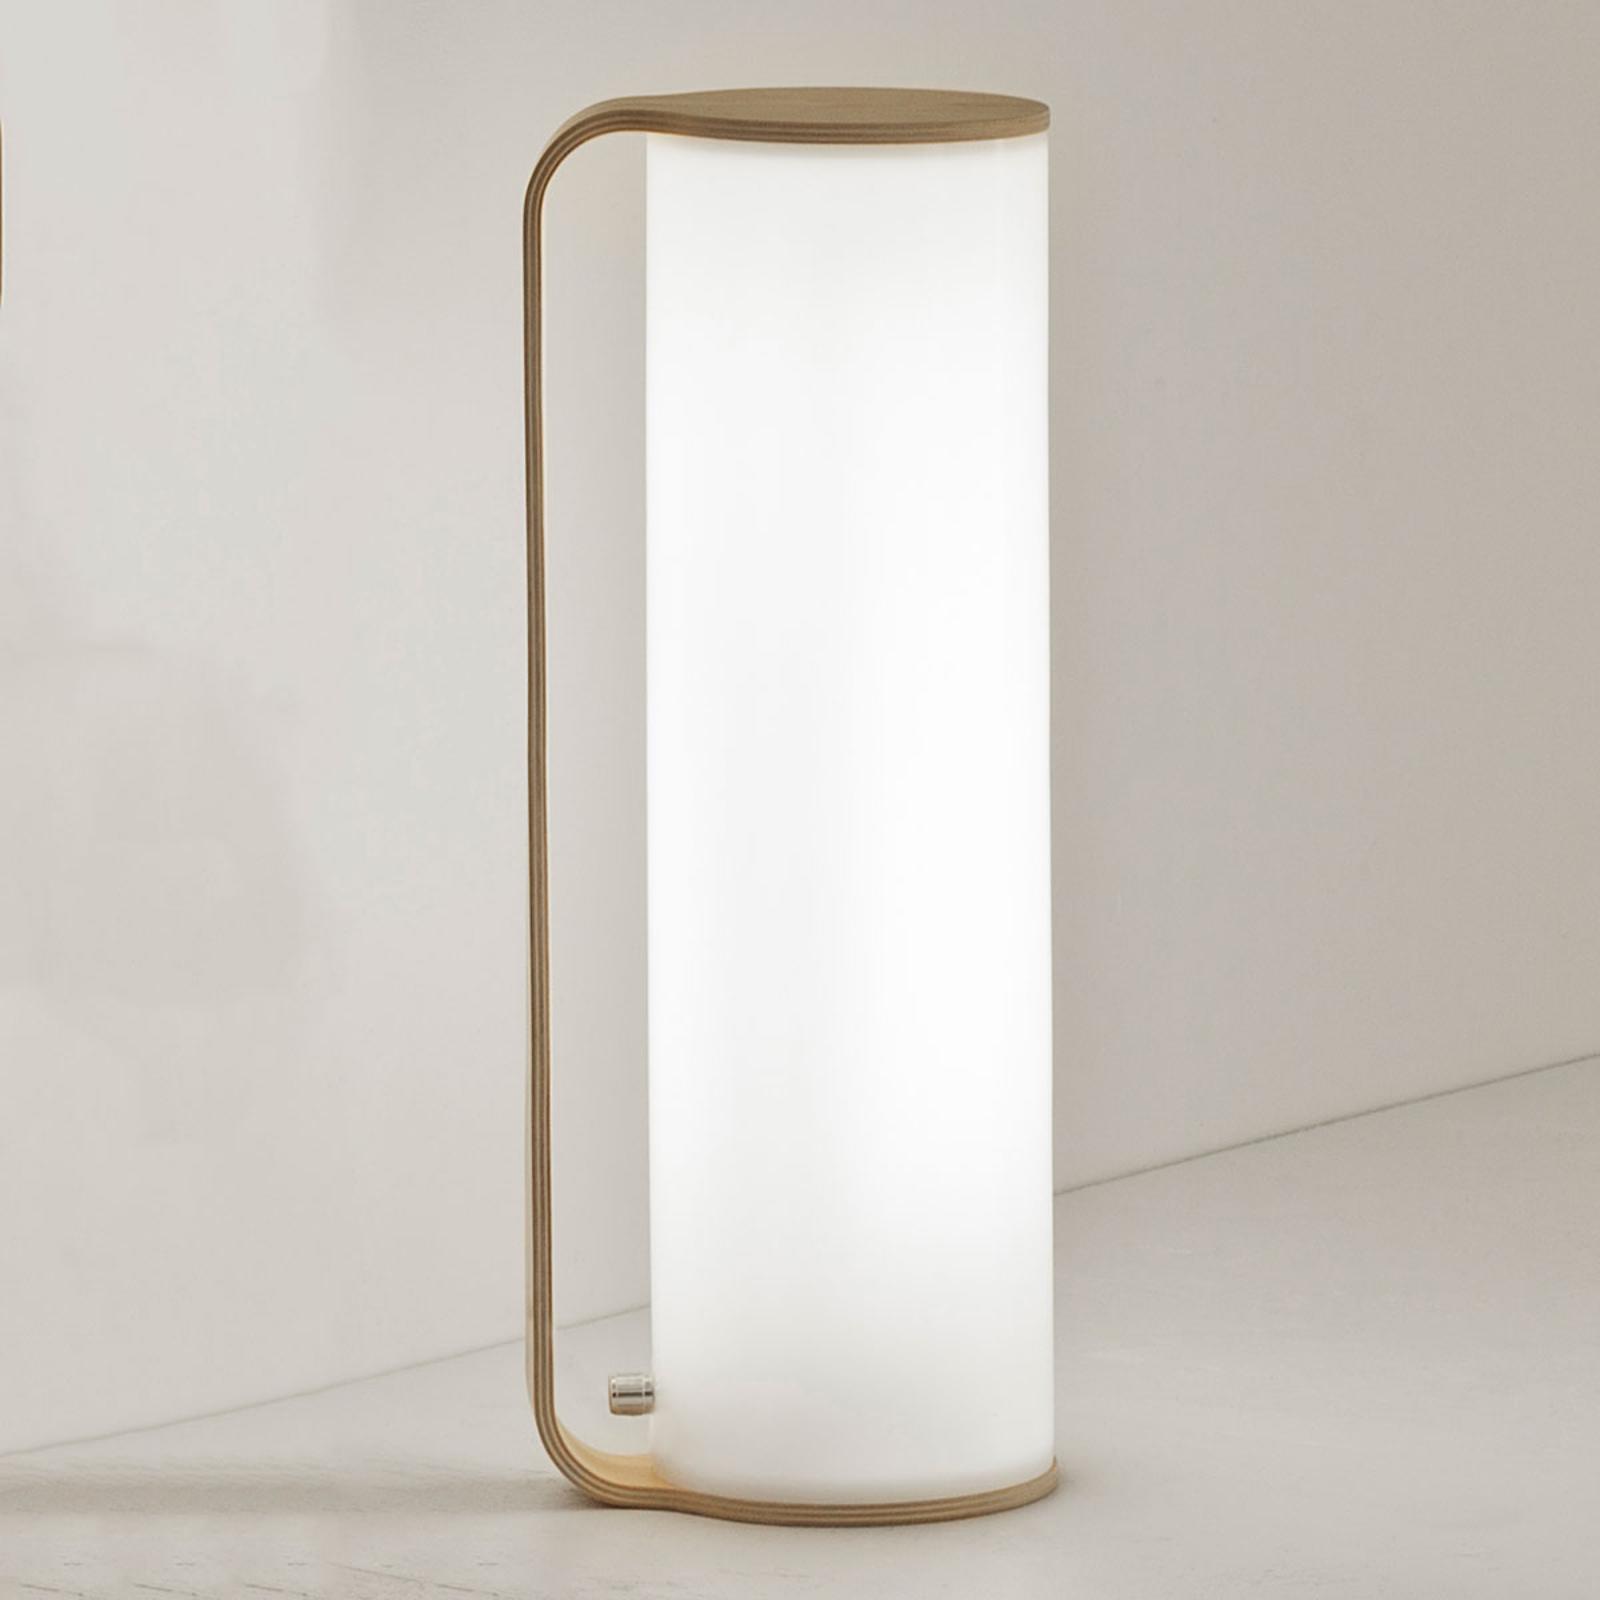 Innolux Tubo LED-Therapieleuchte dimmbar esche